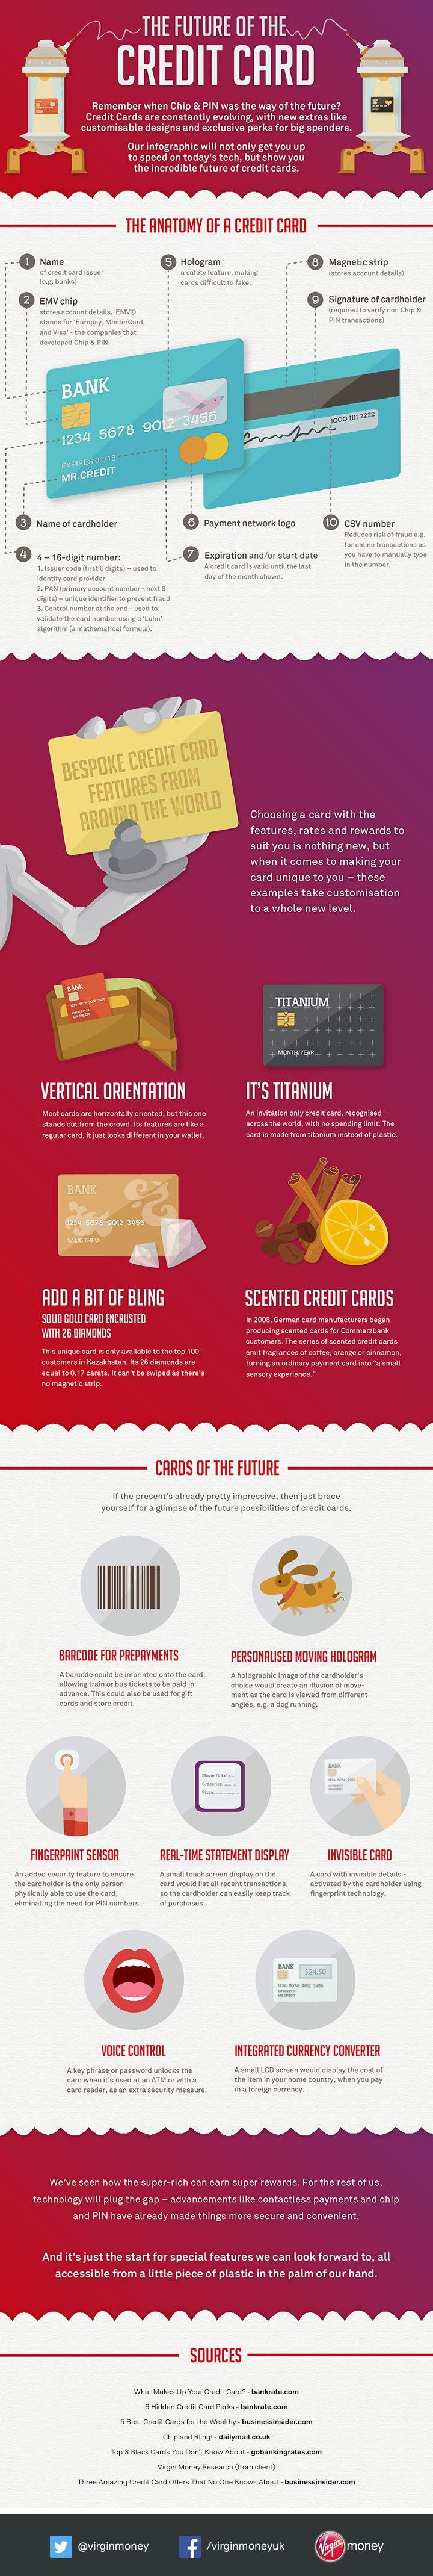 credit cards virgin